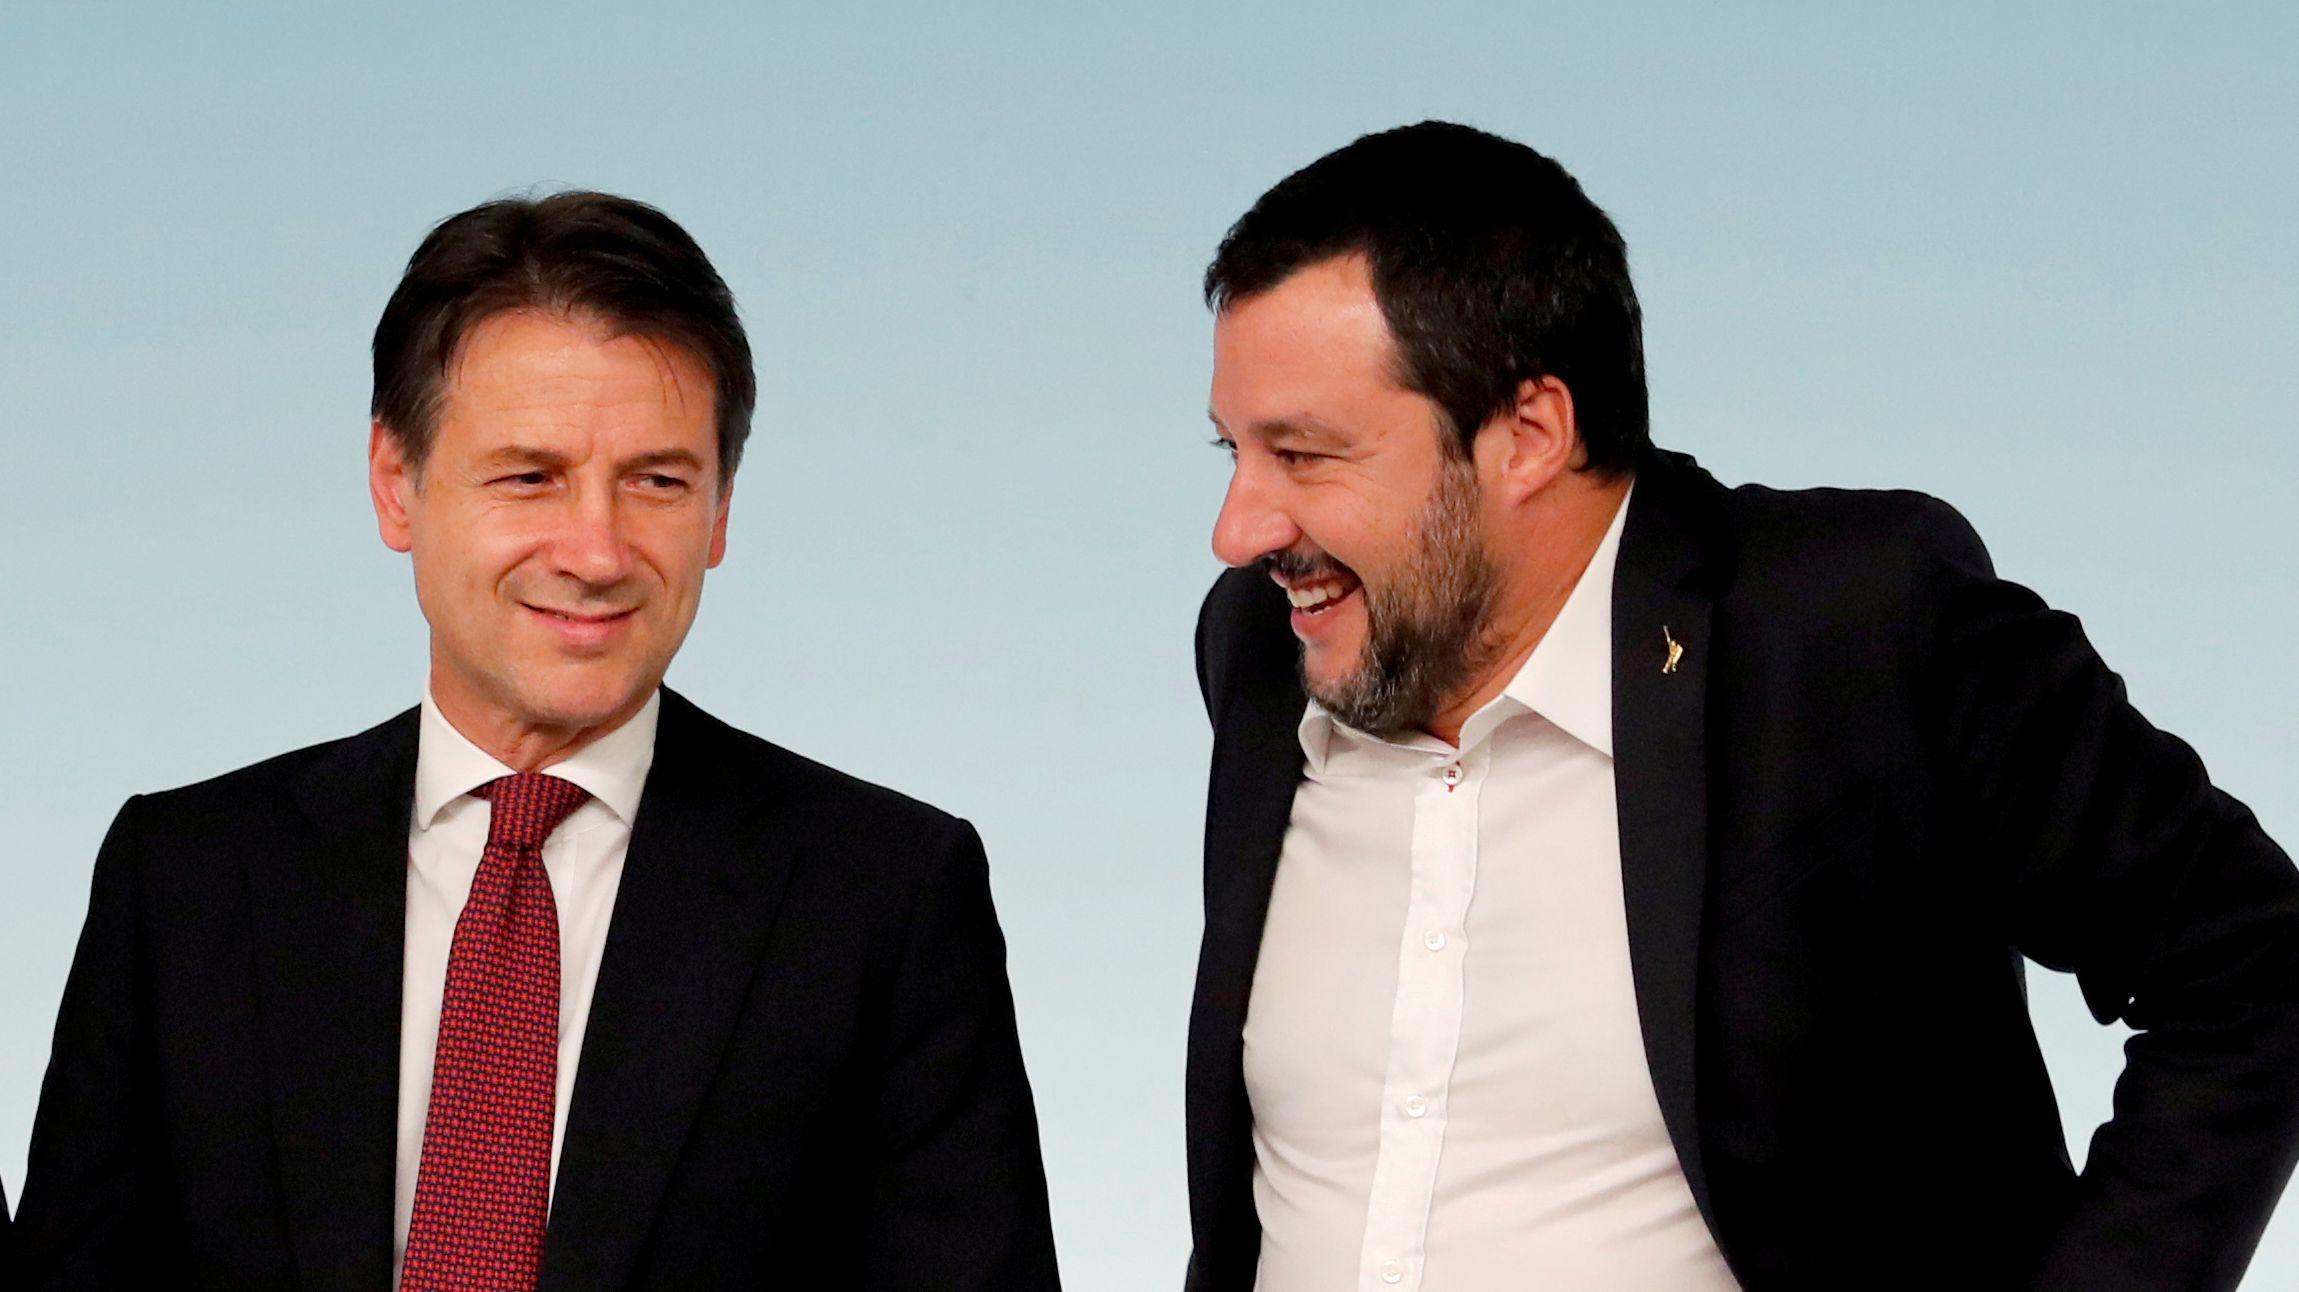 Italien: Ministerpräsident Giuseppe Conte und  Innenminister und Vize-Premier Matteo Salvini